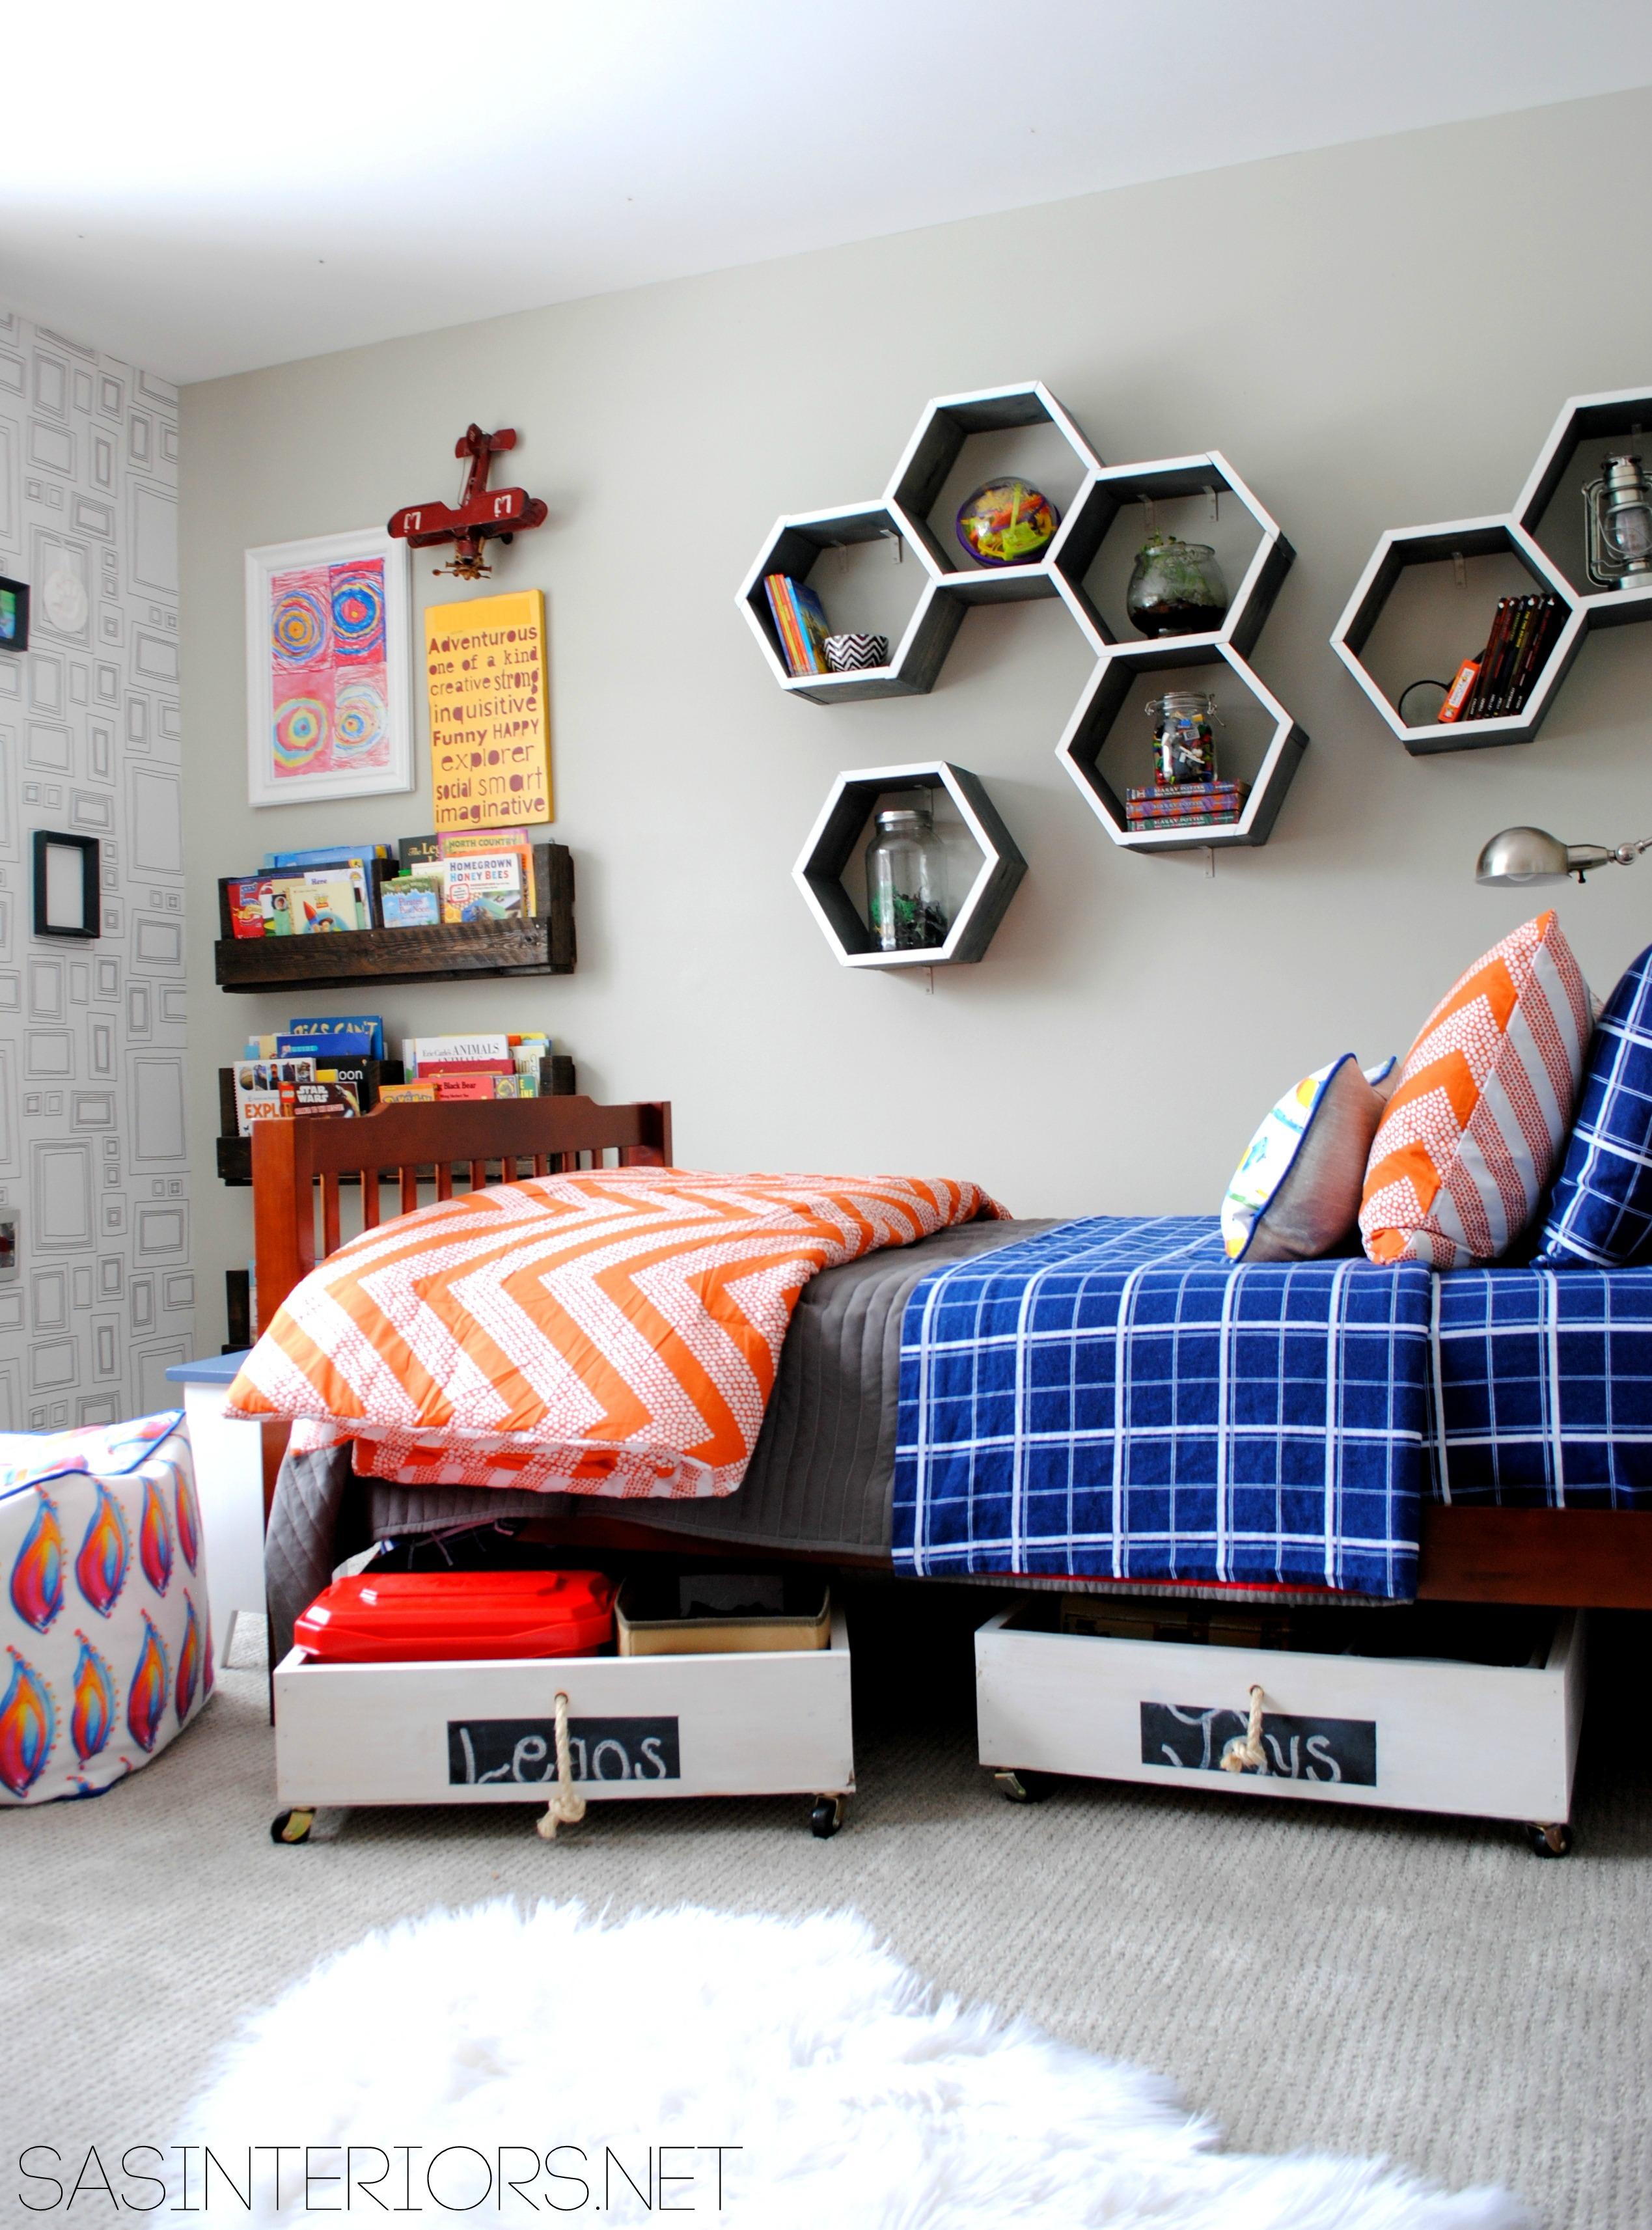 10 genius toy storage ideas for your kid's room  diy kids